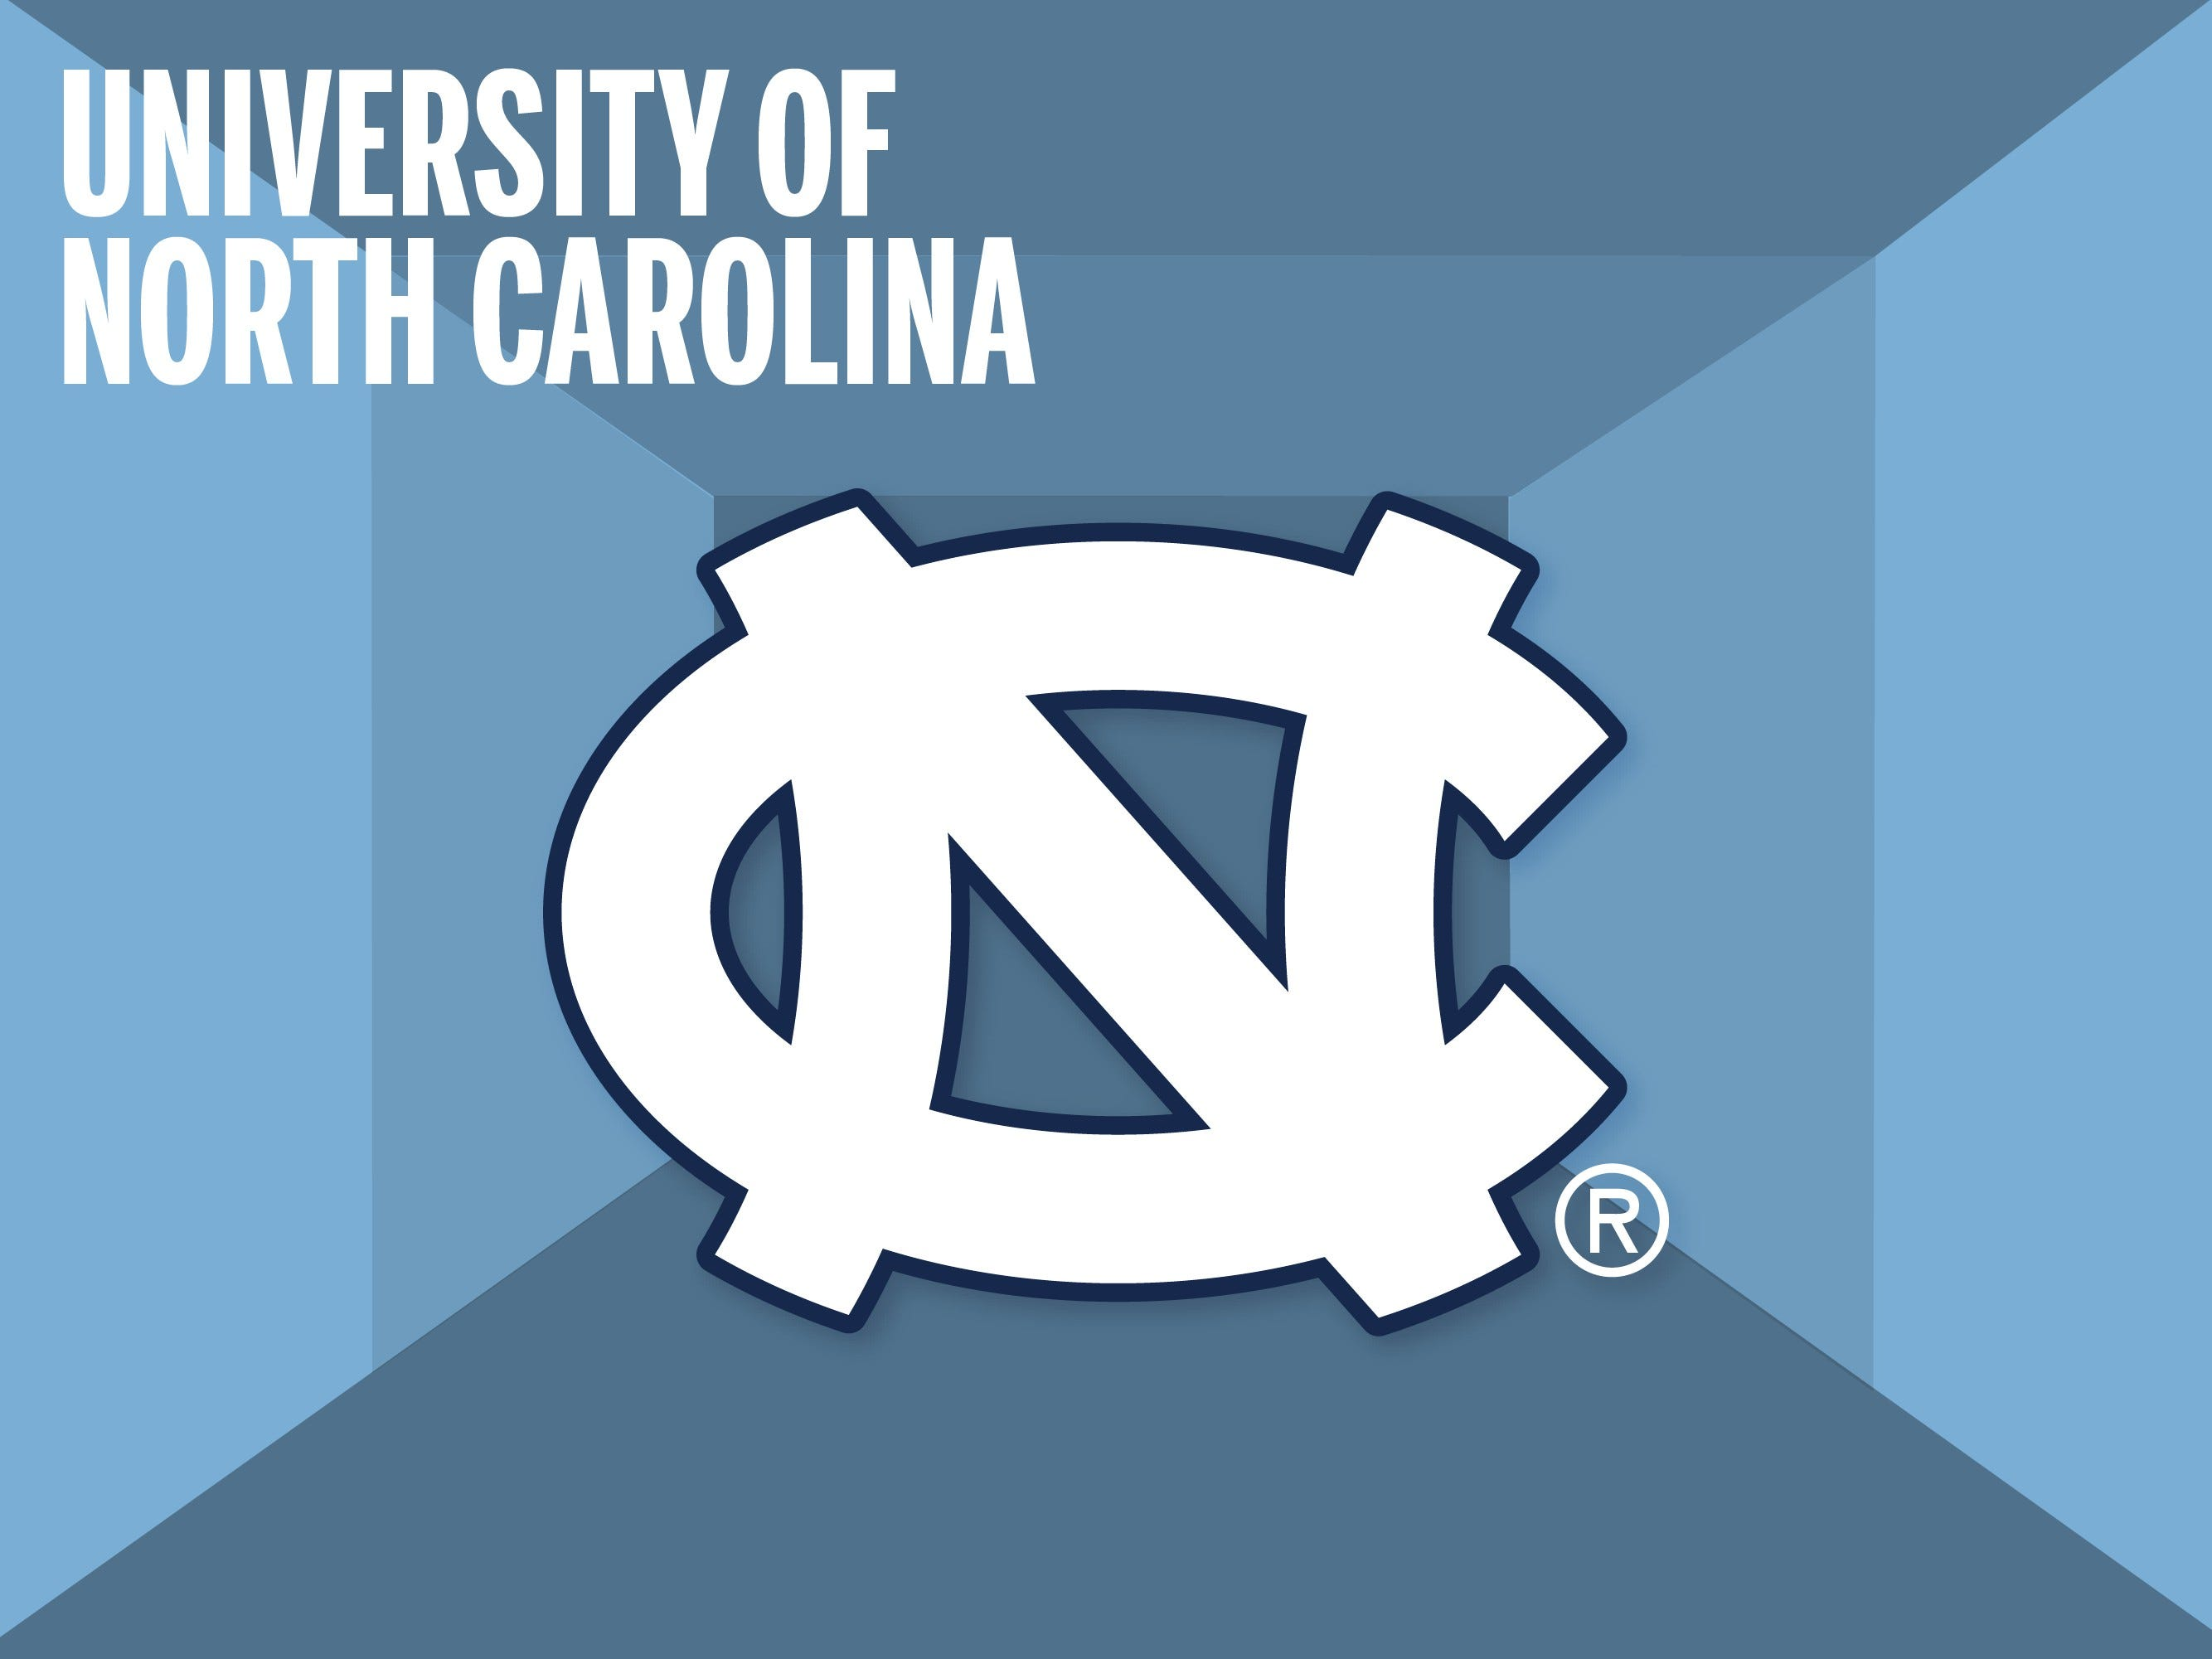 University of North Carolina College Fan Shop